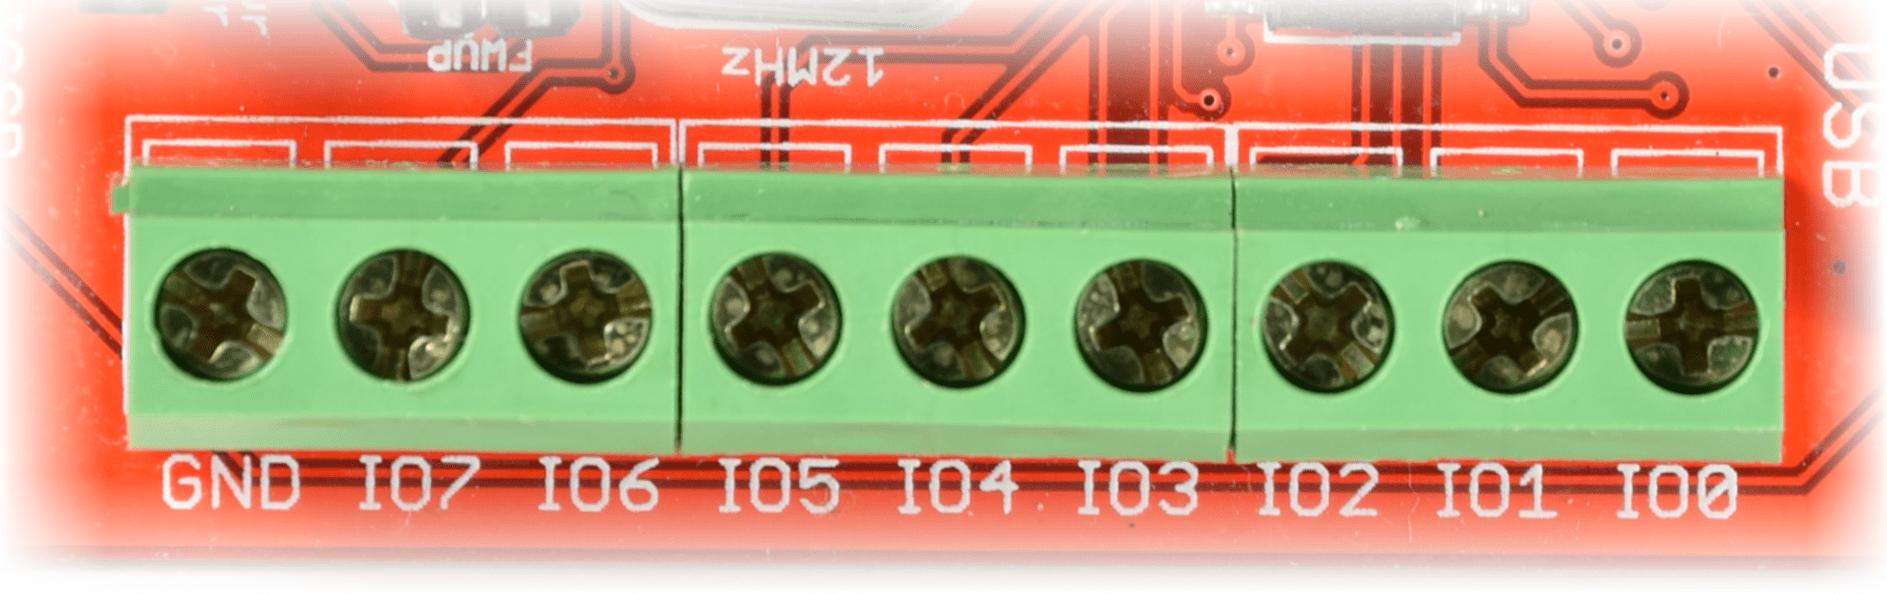 USBGpio8-IOConenctors